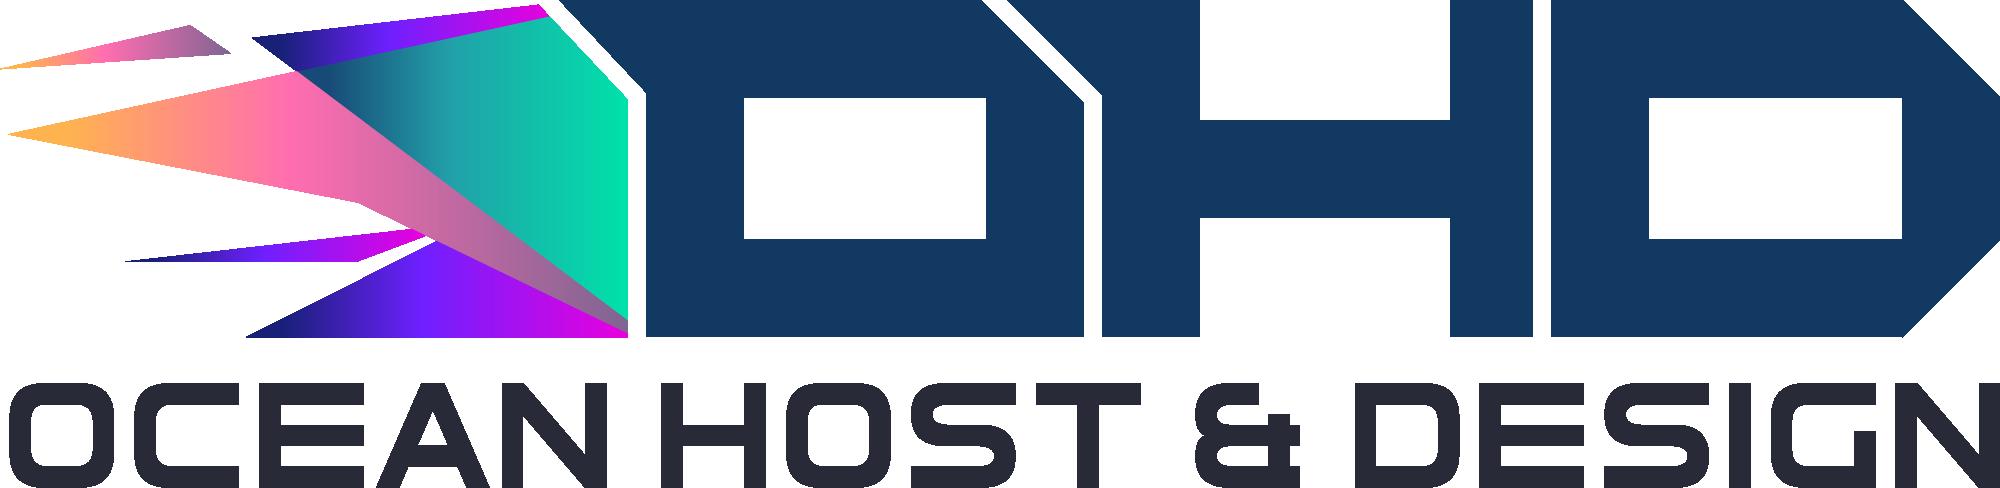 Ocean Host & Design